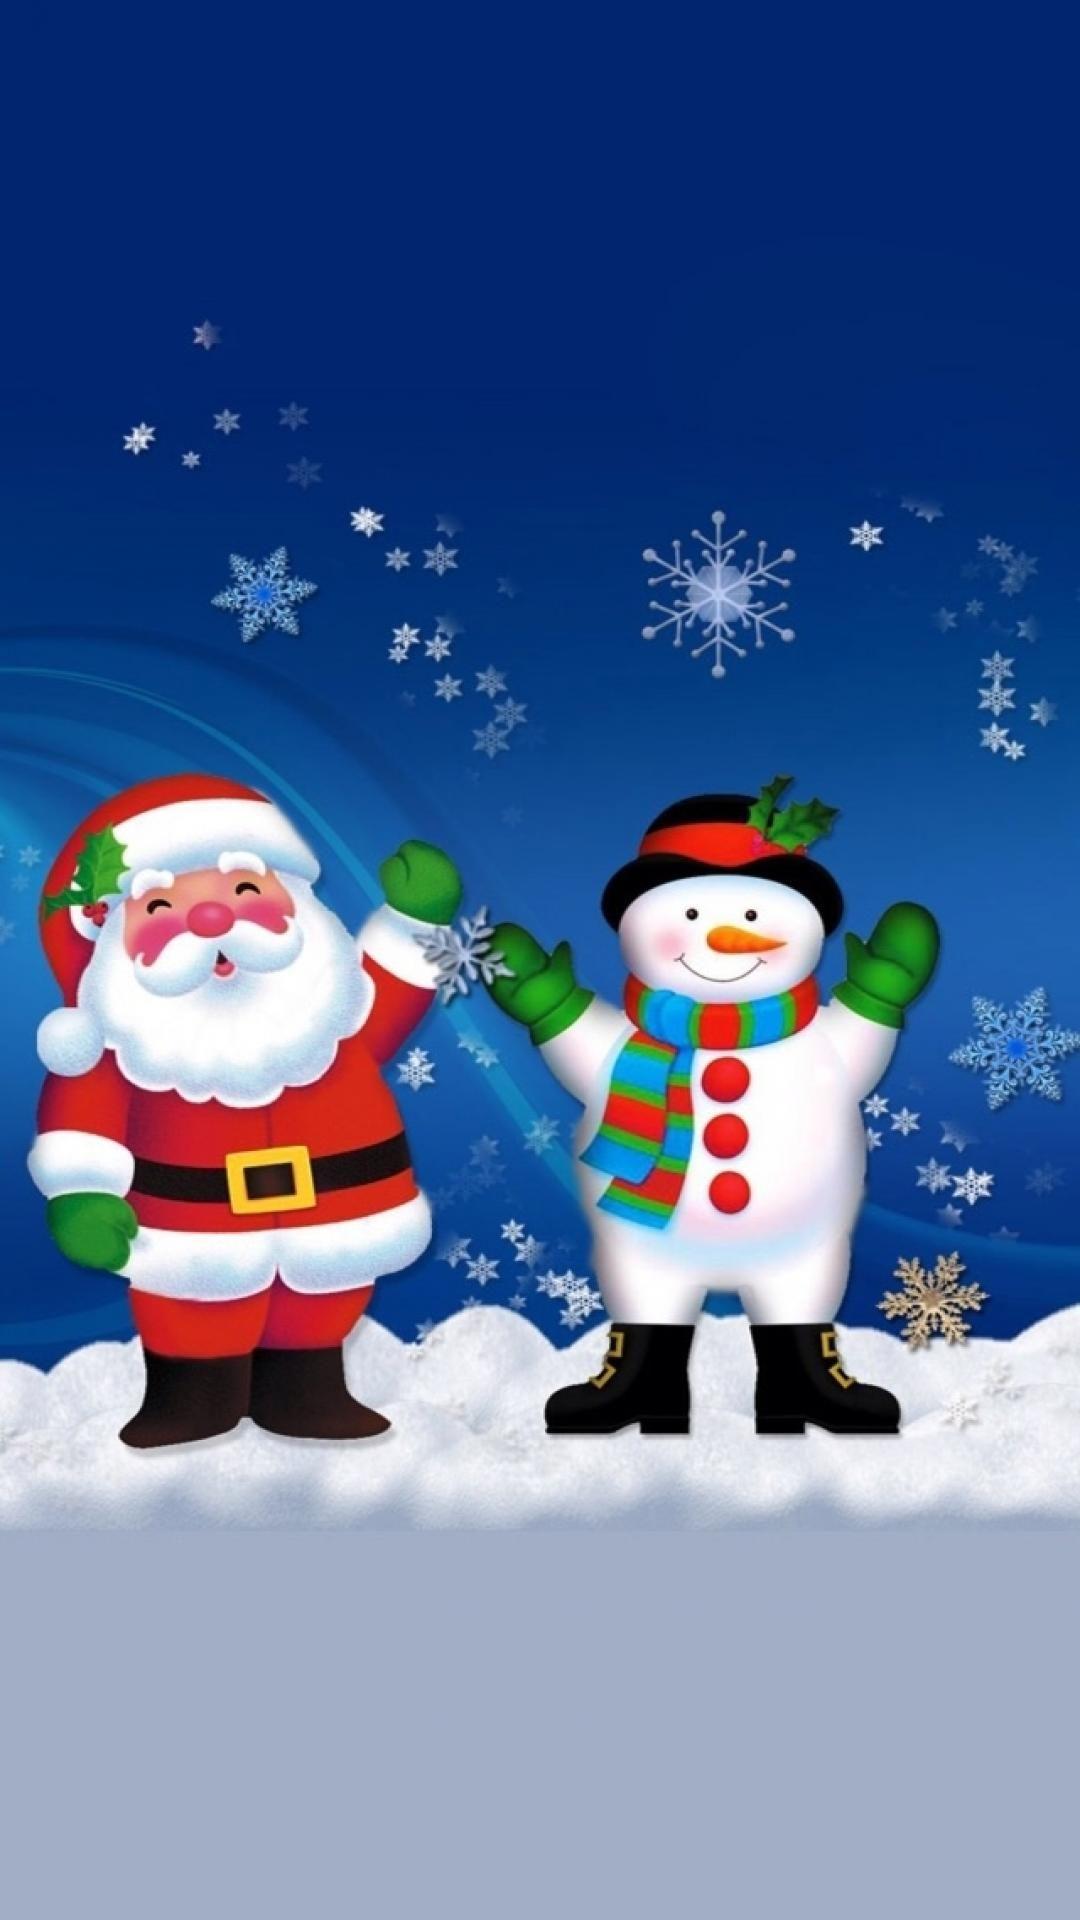 Merry Christmas Santa Claus And Snowman wallpaper